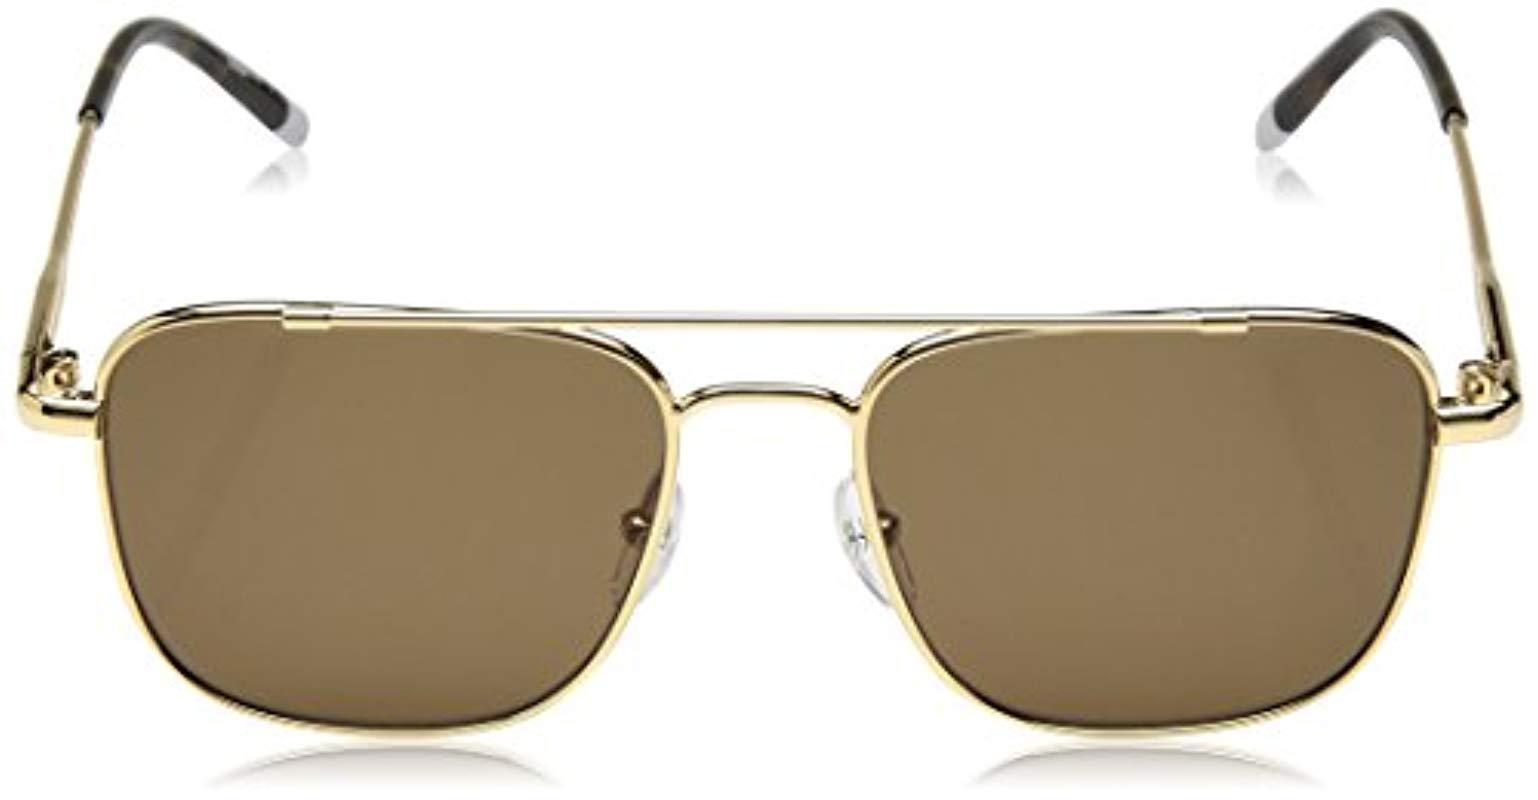 815dc1ff06c4 Calvin Klein - Metallic Unisex Ck2150s Navigator Sunglasses Aviator, Gold,  53 Mm - Lyst. View fullscreen